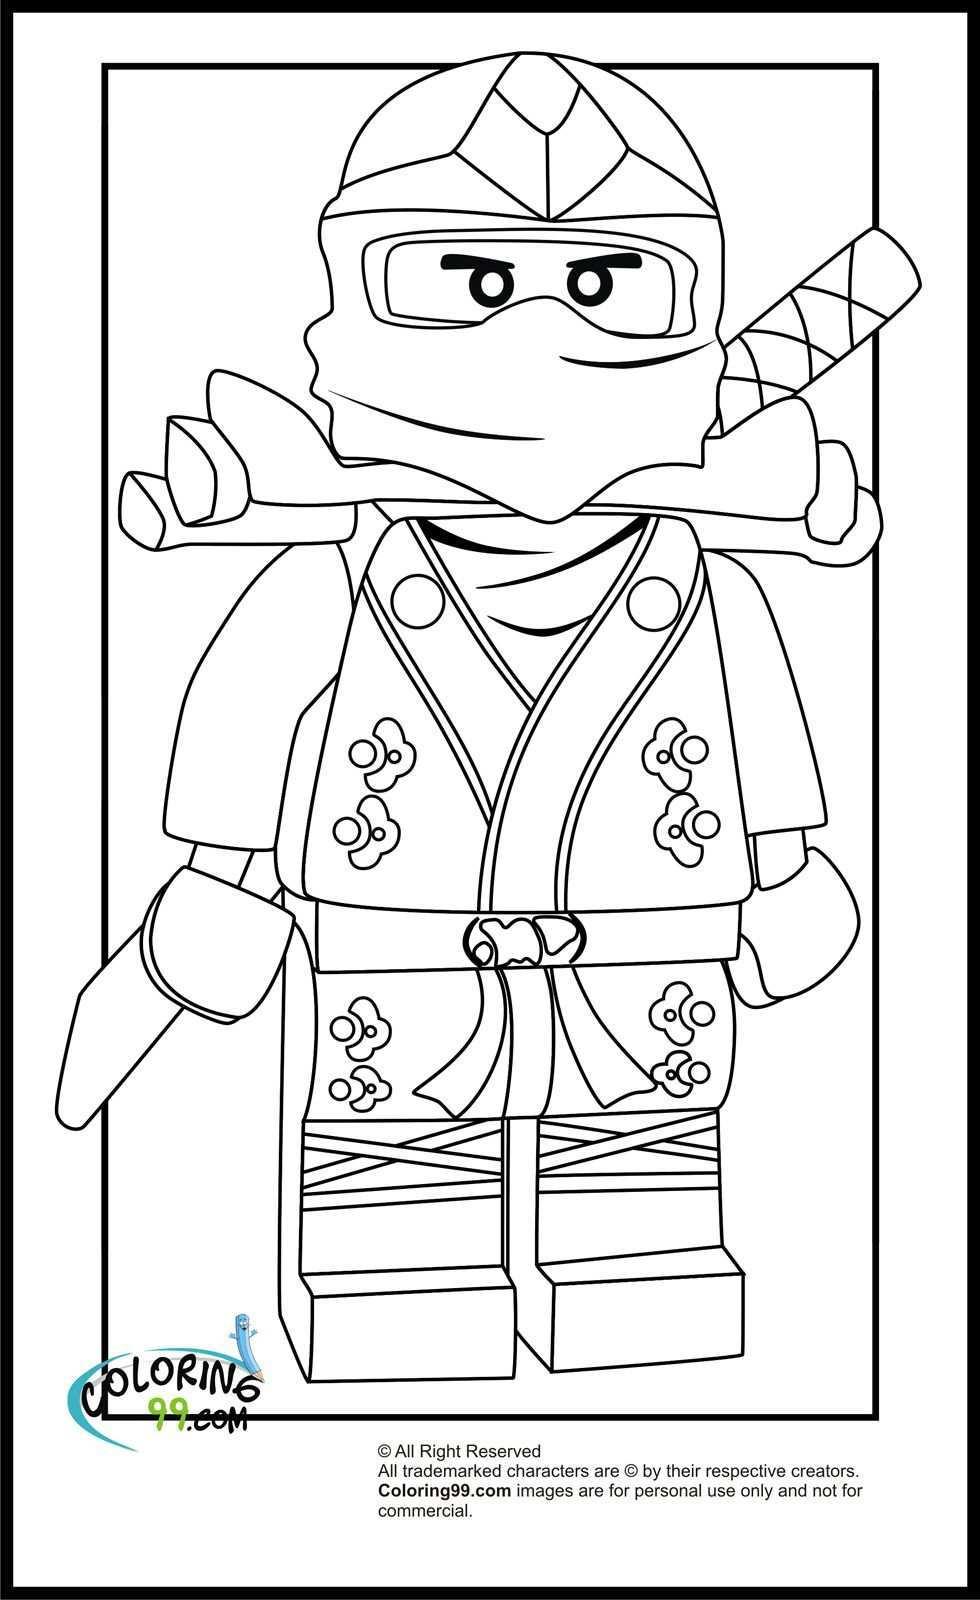 Ninjago Lloyd Green Ninja Zx Jpg 980 1 600 Pixels Ninjago Ausmalbilder Ausmalbilder Ausmalbilder Jungs